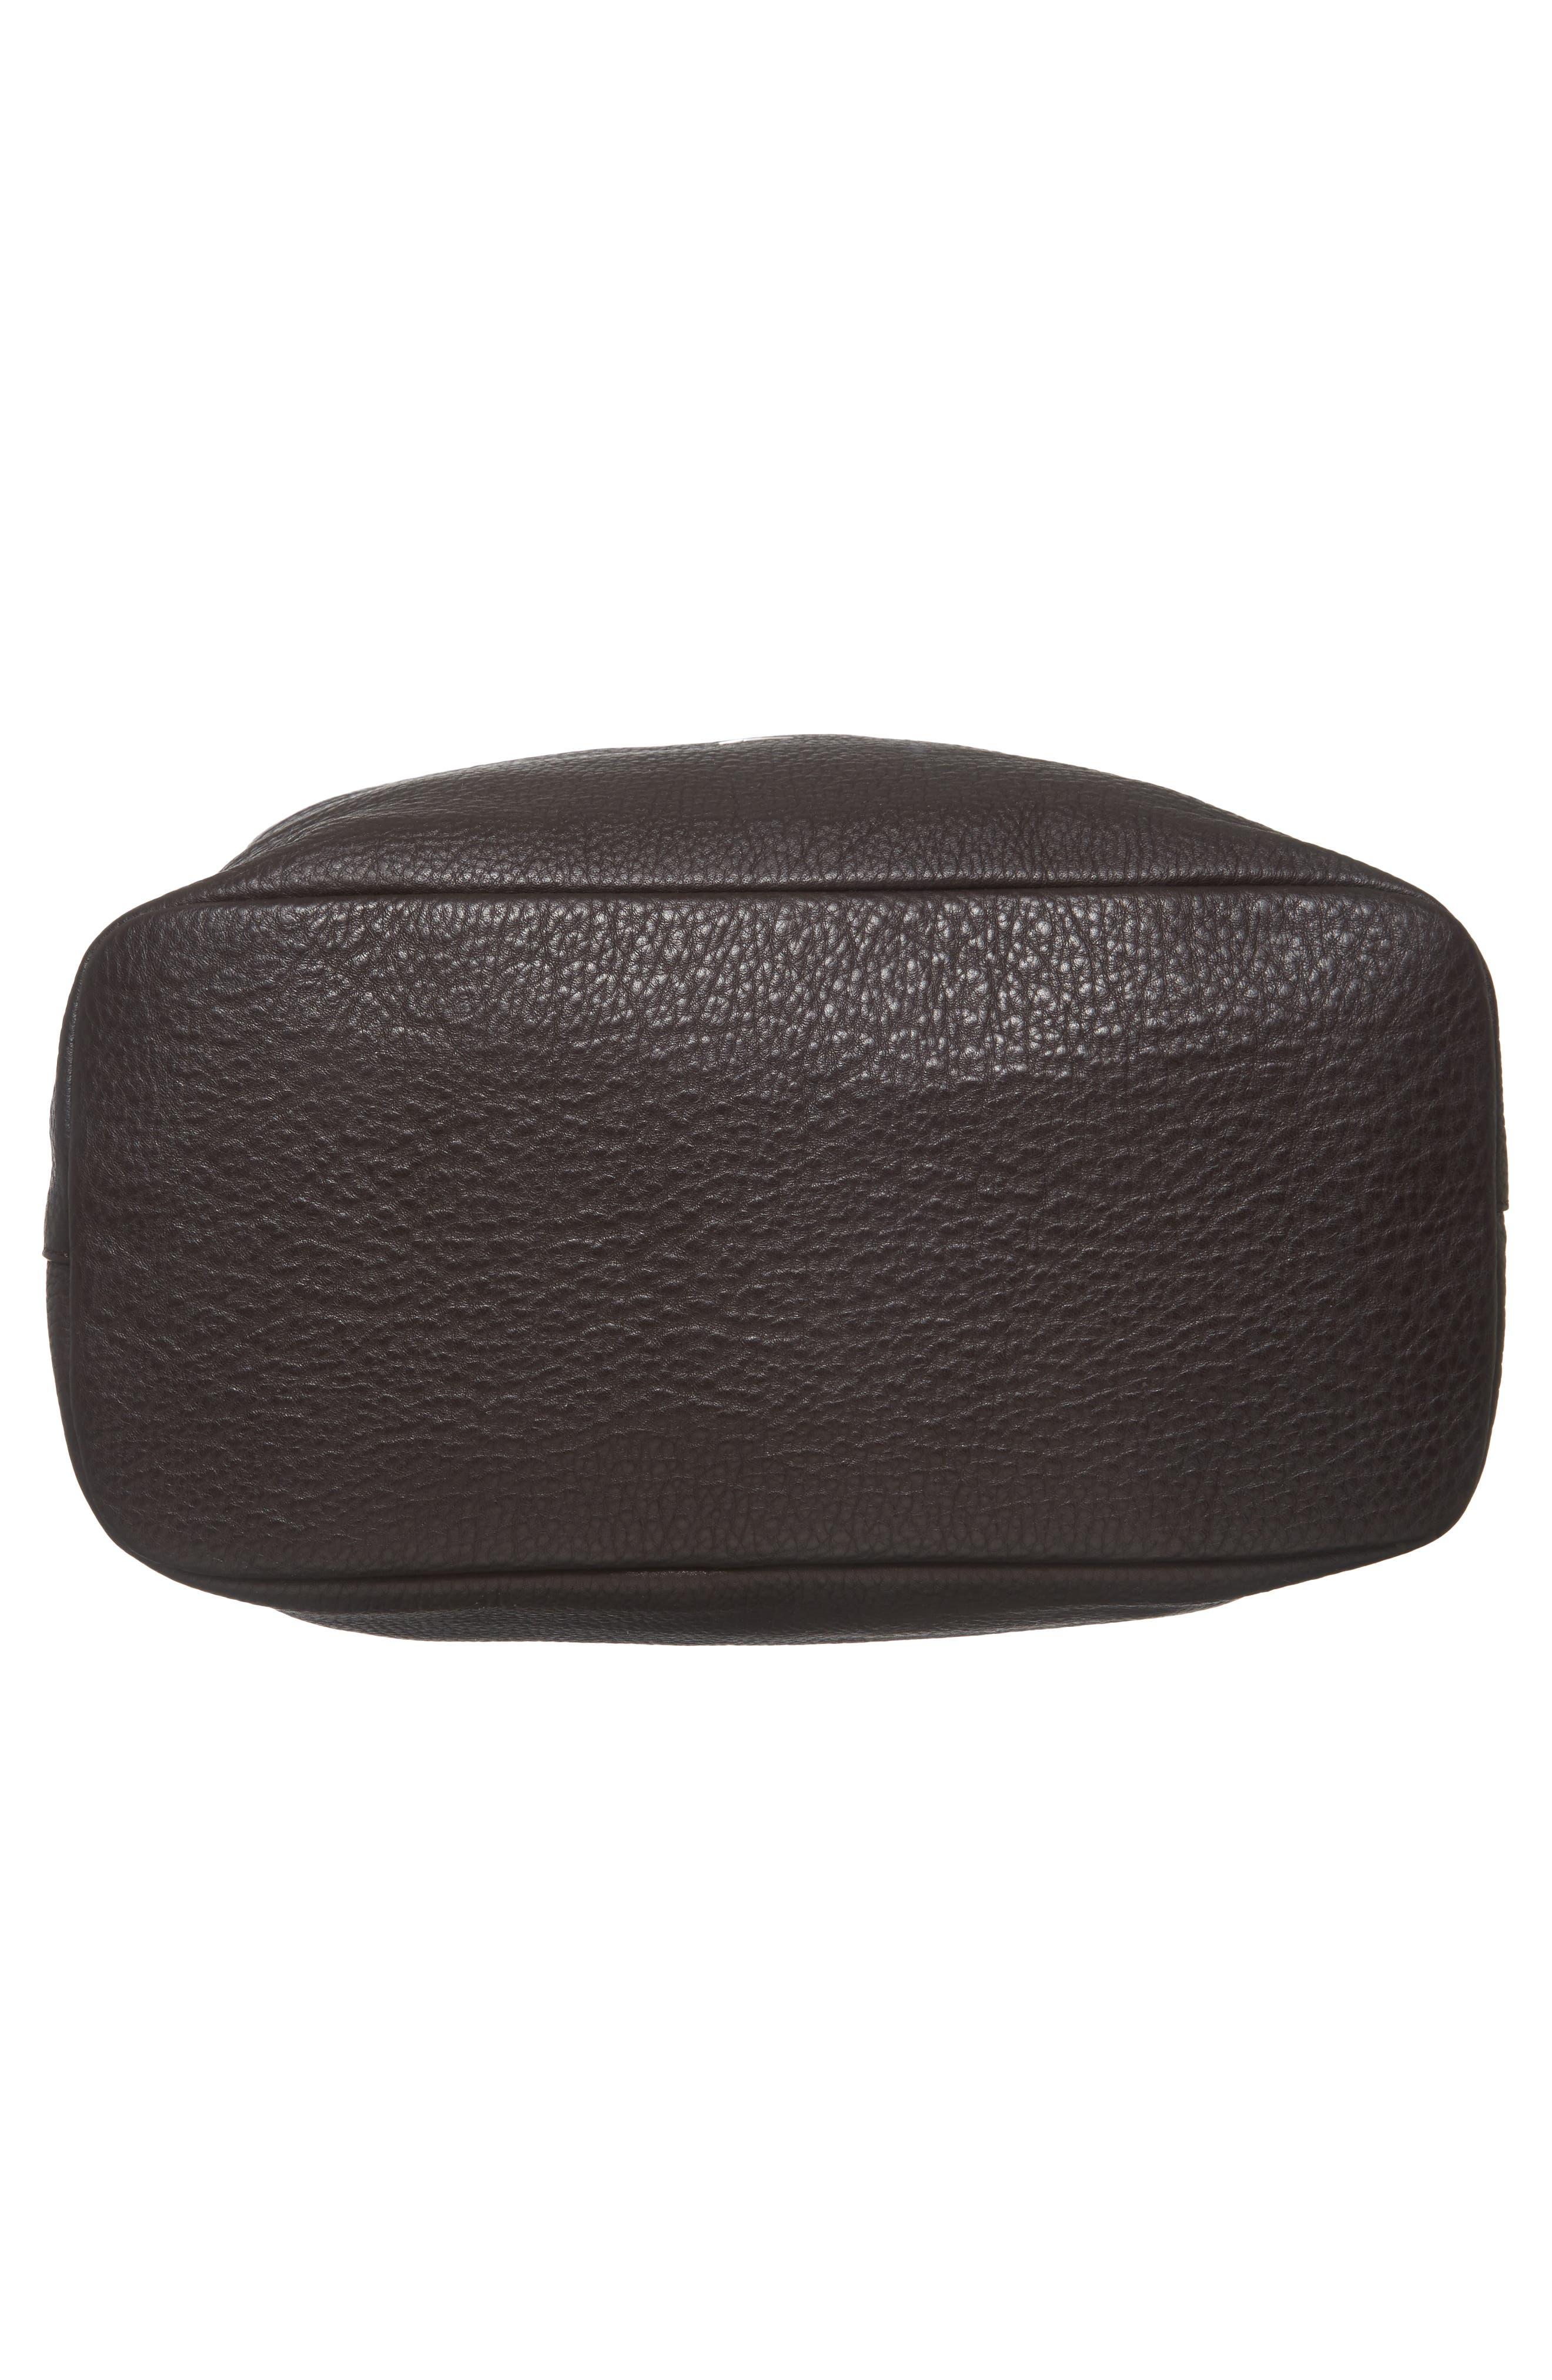 SHINOLA,                             Relaxed Calfskin Leather Hobo Bag,                             Alternate thumbnail 6, color,                             240